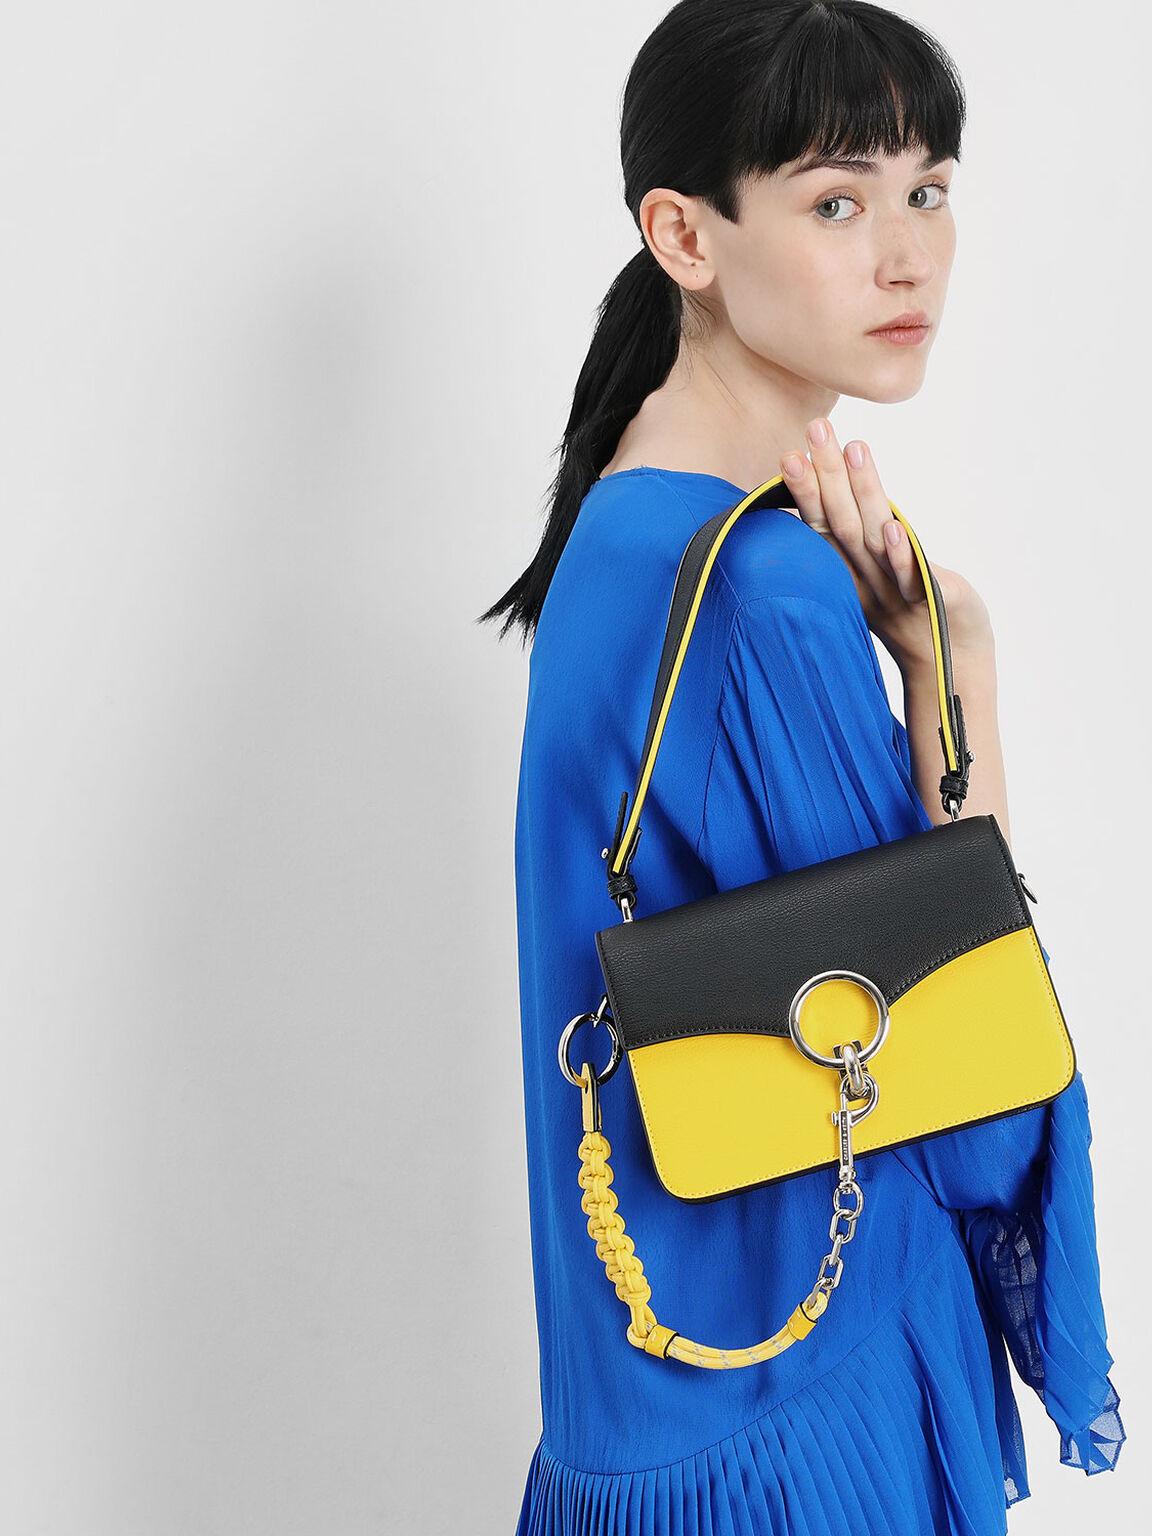 Chain Link Shoulder Bag, Yellow, hi-res